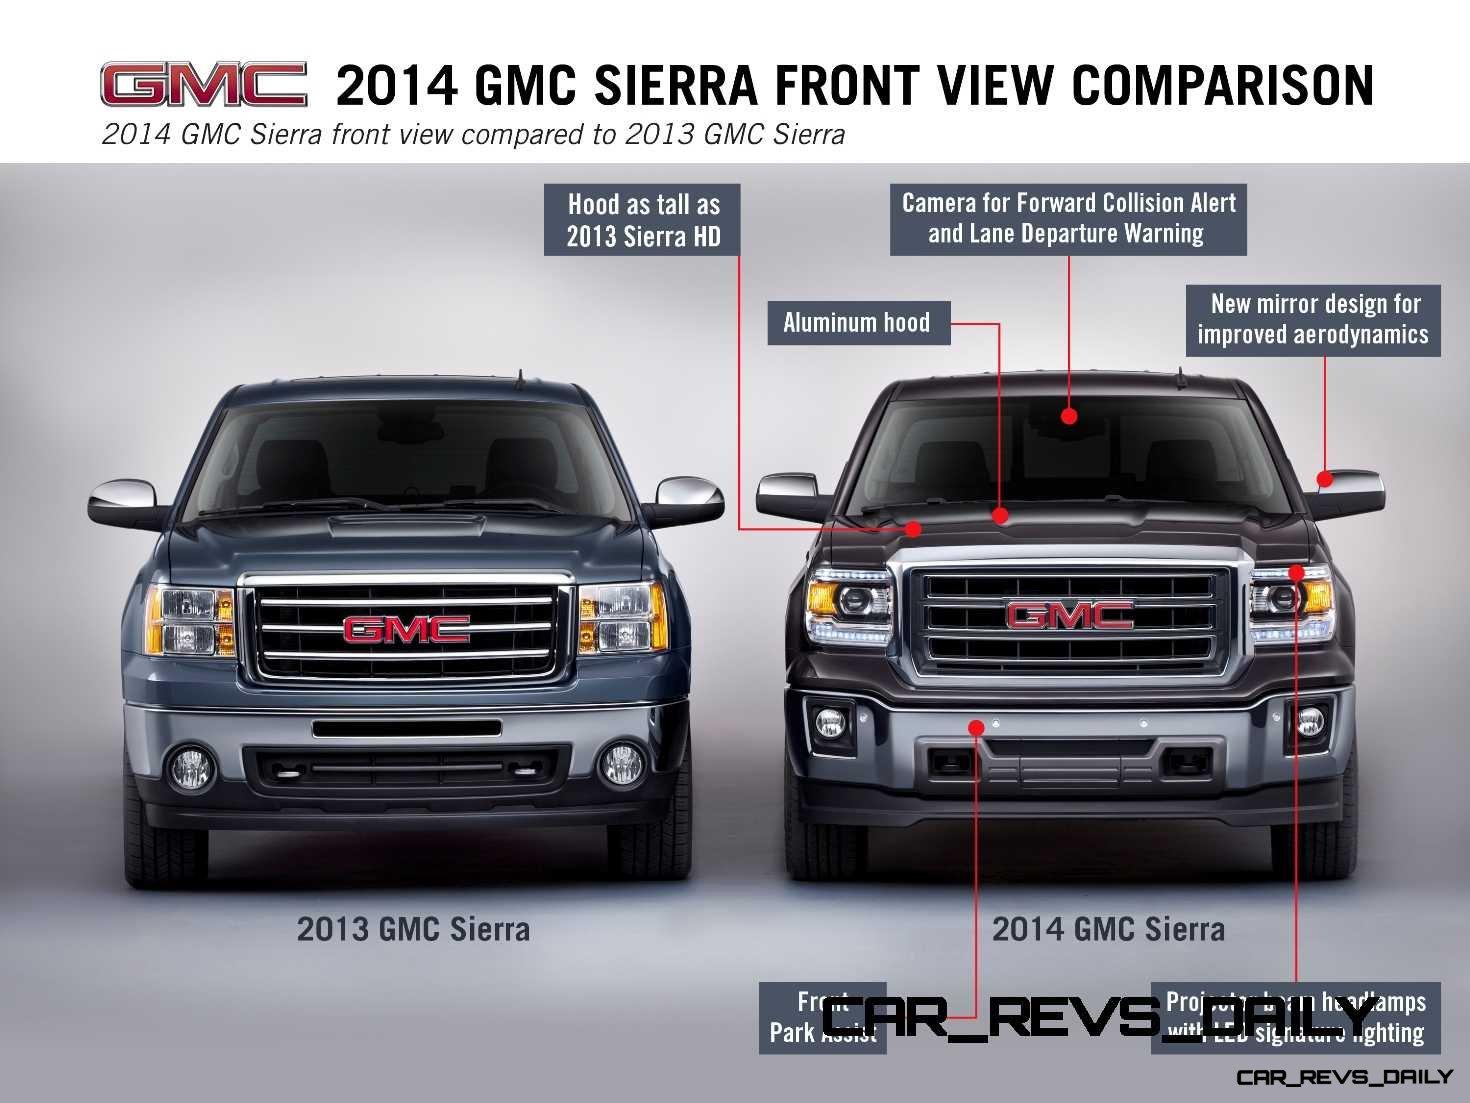 2014 Gmc Sierra Slt Crew Cab In Iridium Metallic Front End Detail Regular View Comparison